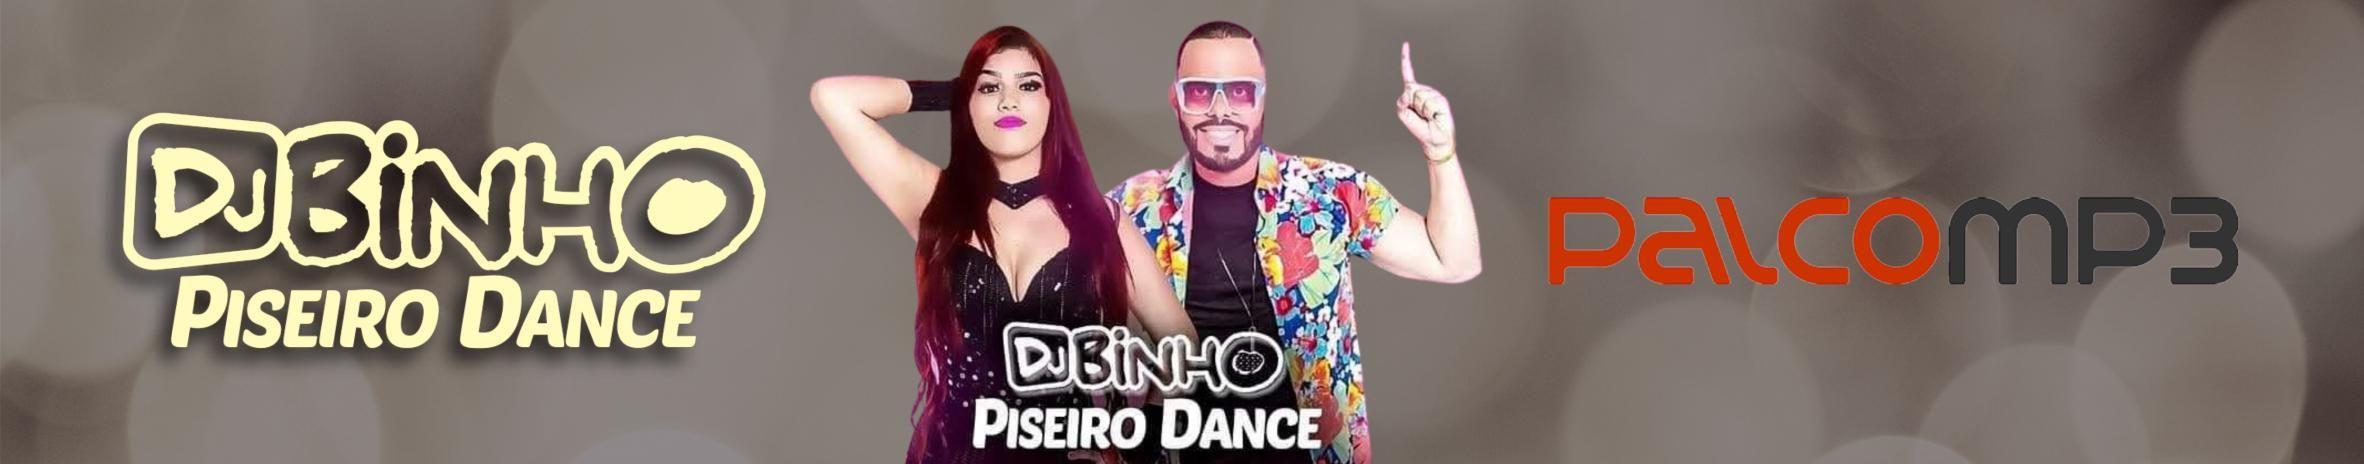 Imagem de capa de DJ Binho Piseiro Dance